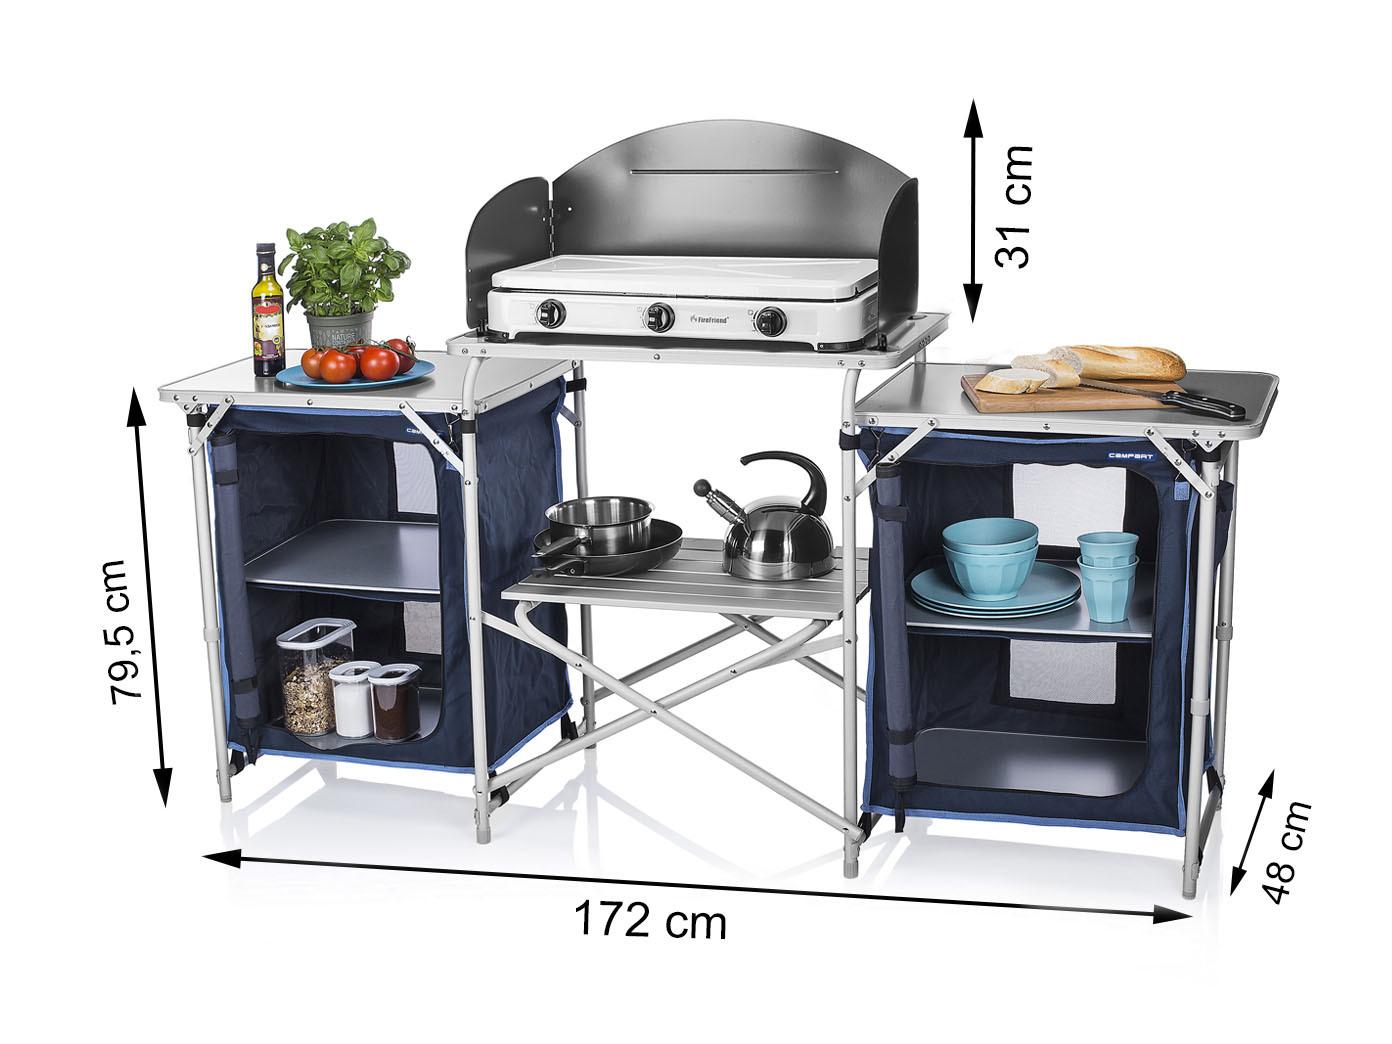 xxl campingk che faltbar outdoor kochen k chenschrank k chenblock campingschrank ebay